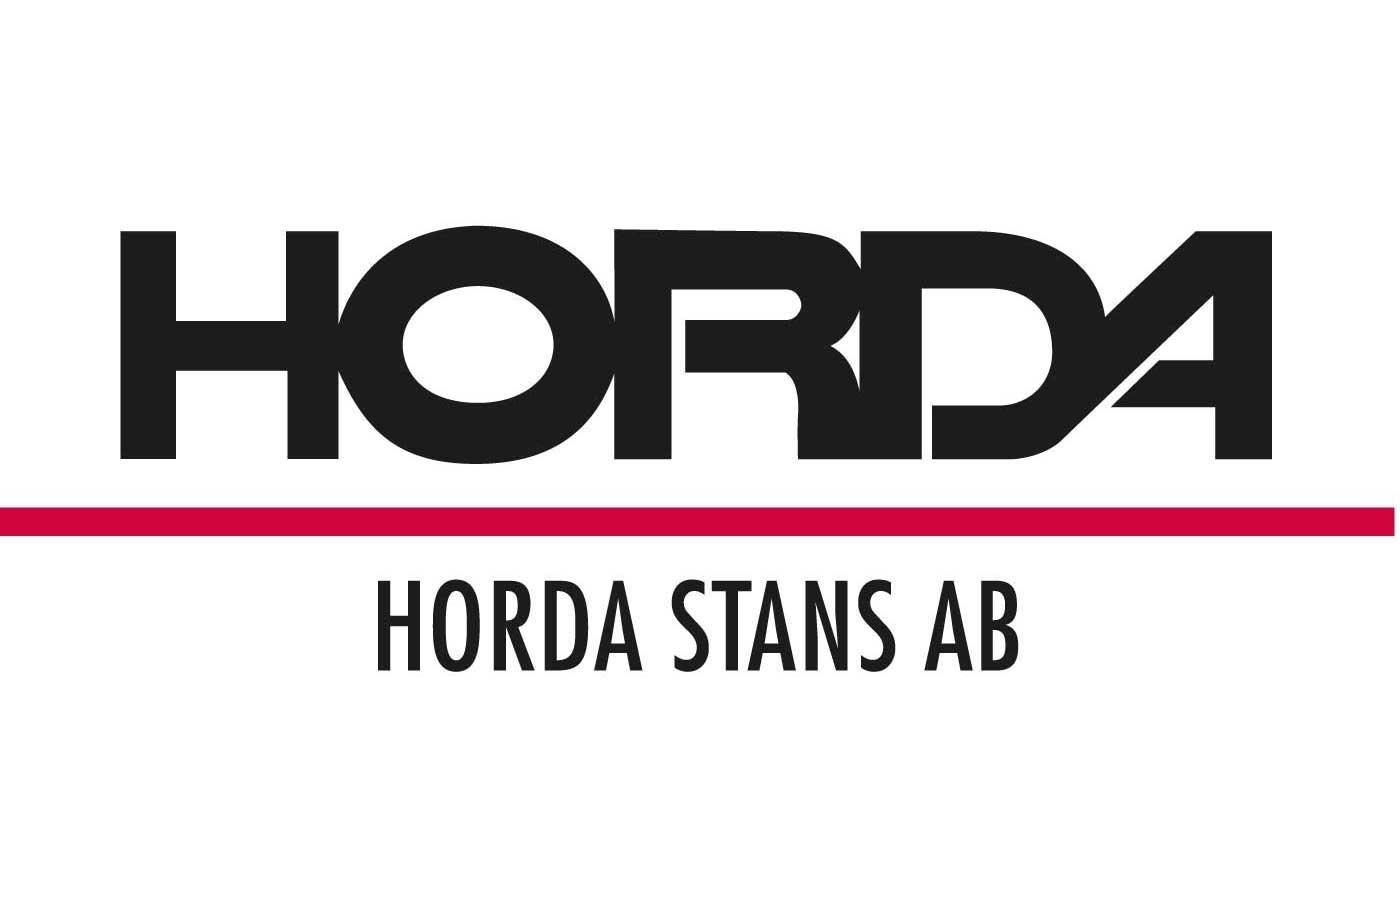 Horda Stans AB logotyp